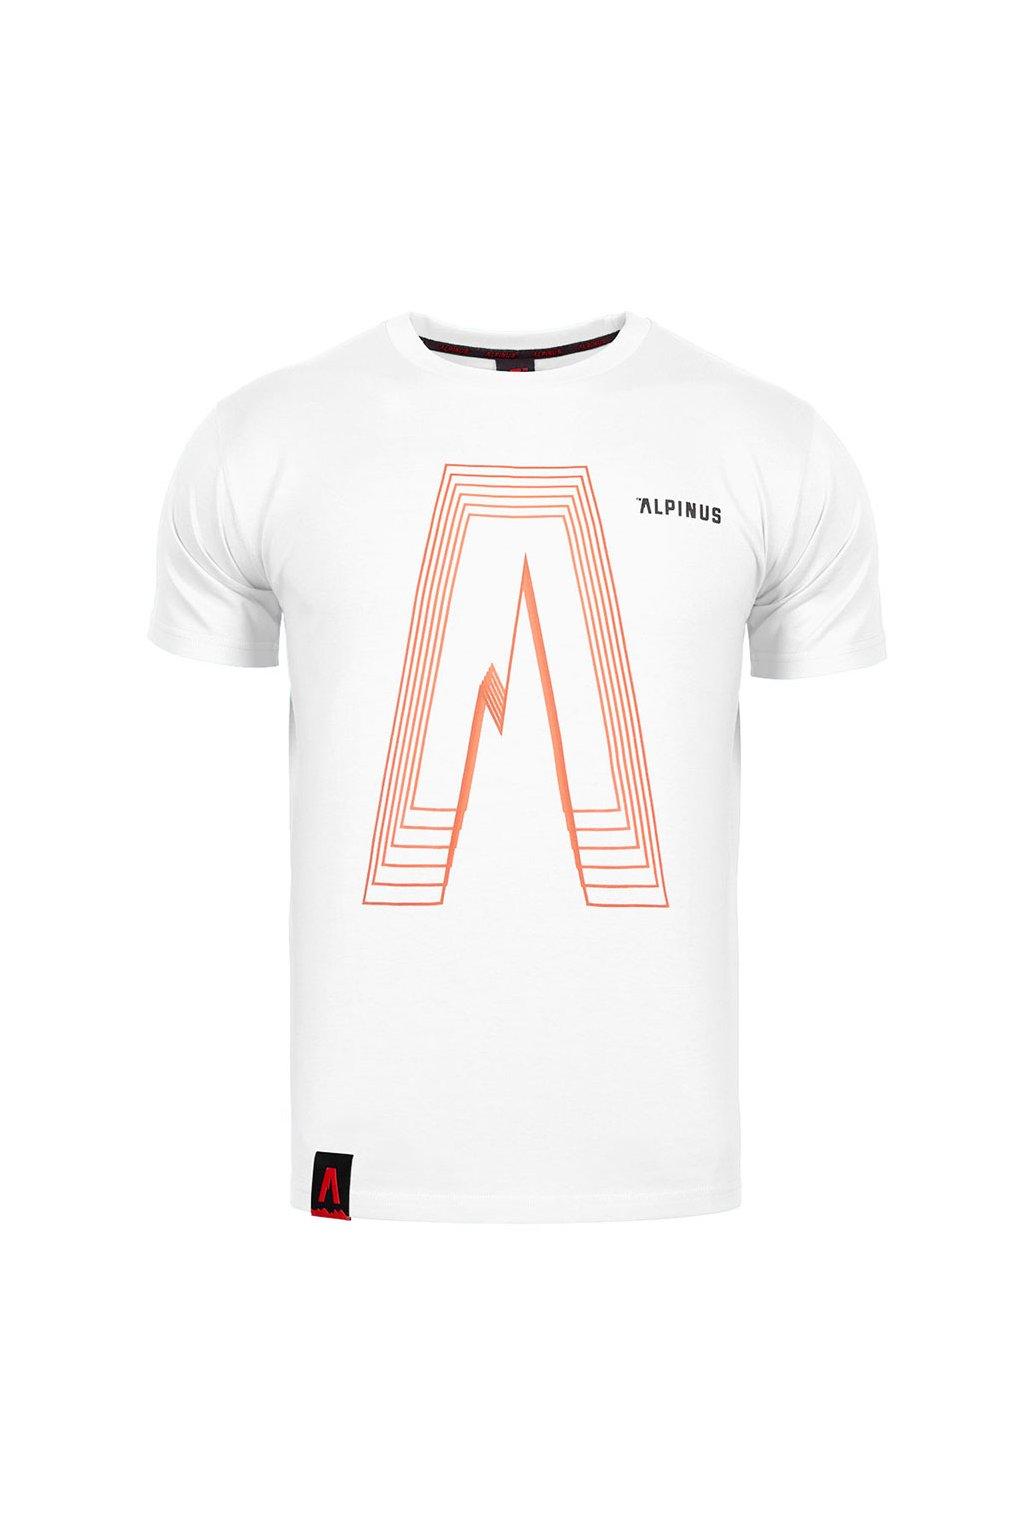 Pánske tričko Alpinus Altai biele ALP20TC0035